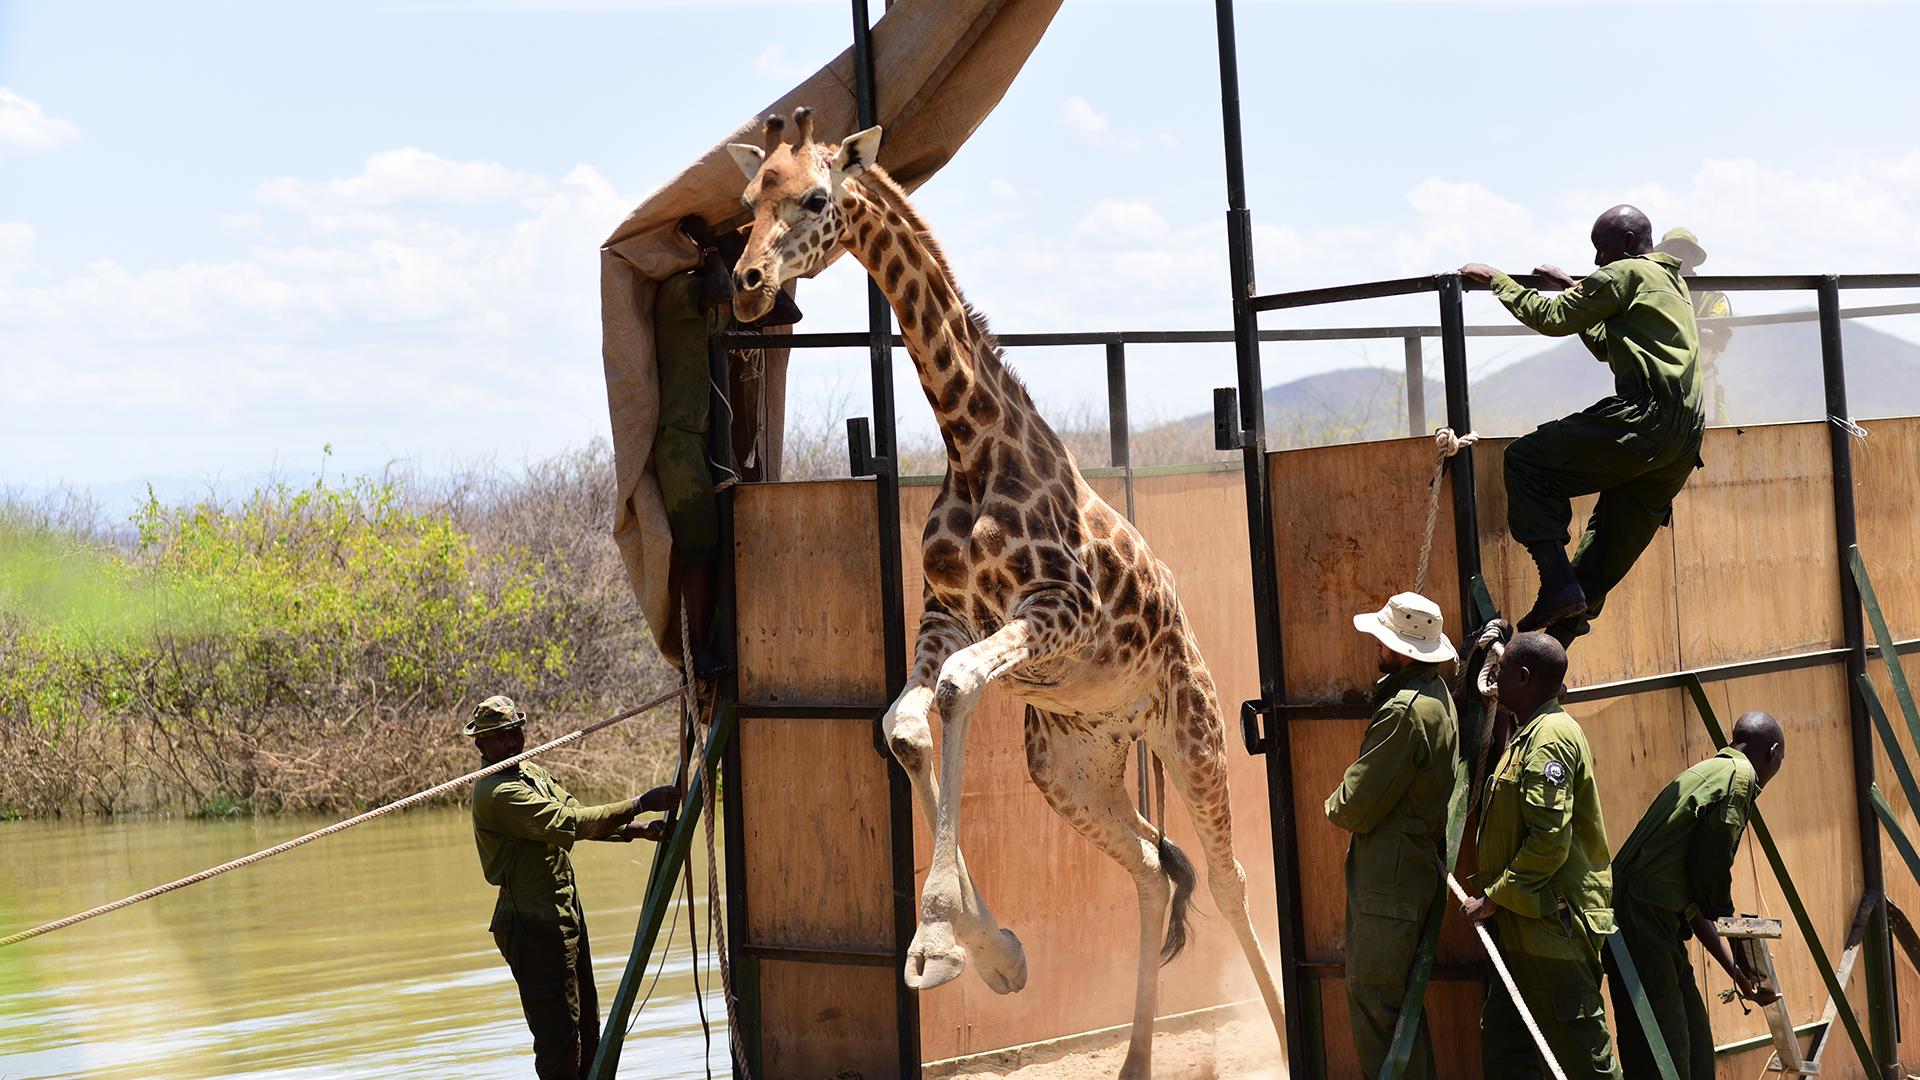 Une jeune girafe nommée